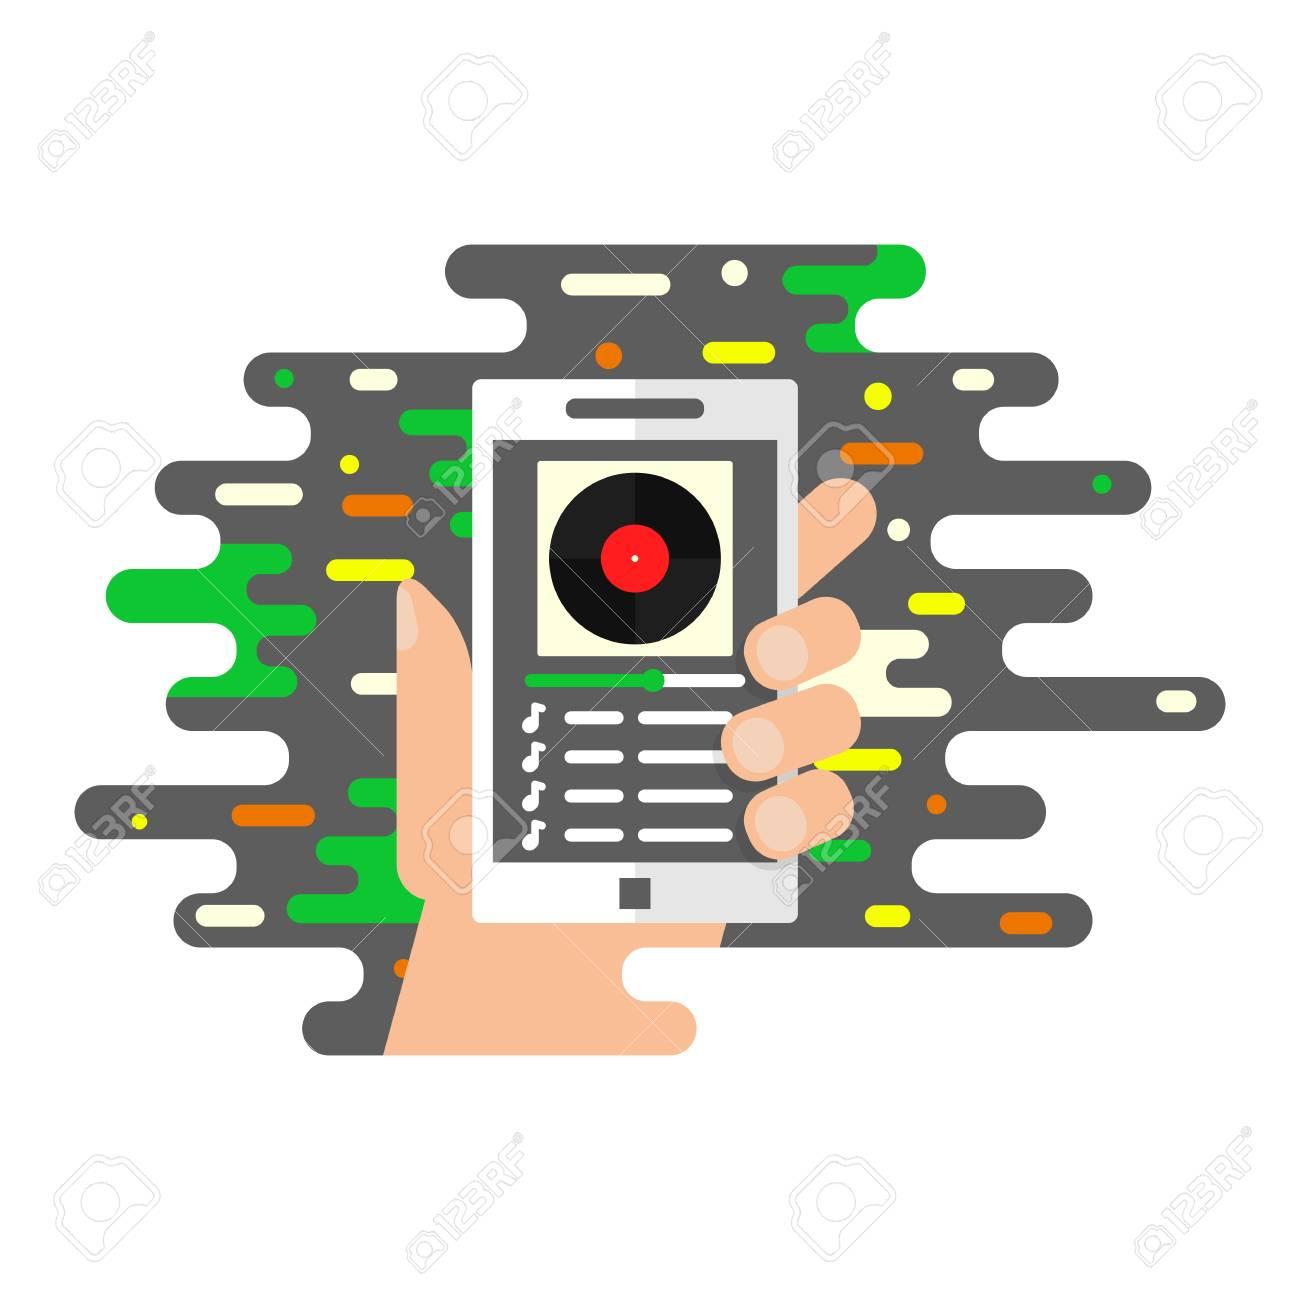 Music app, music player, online radio vector illustration of